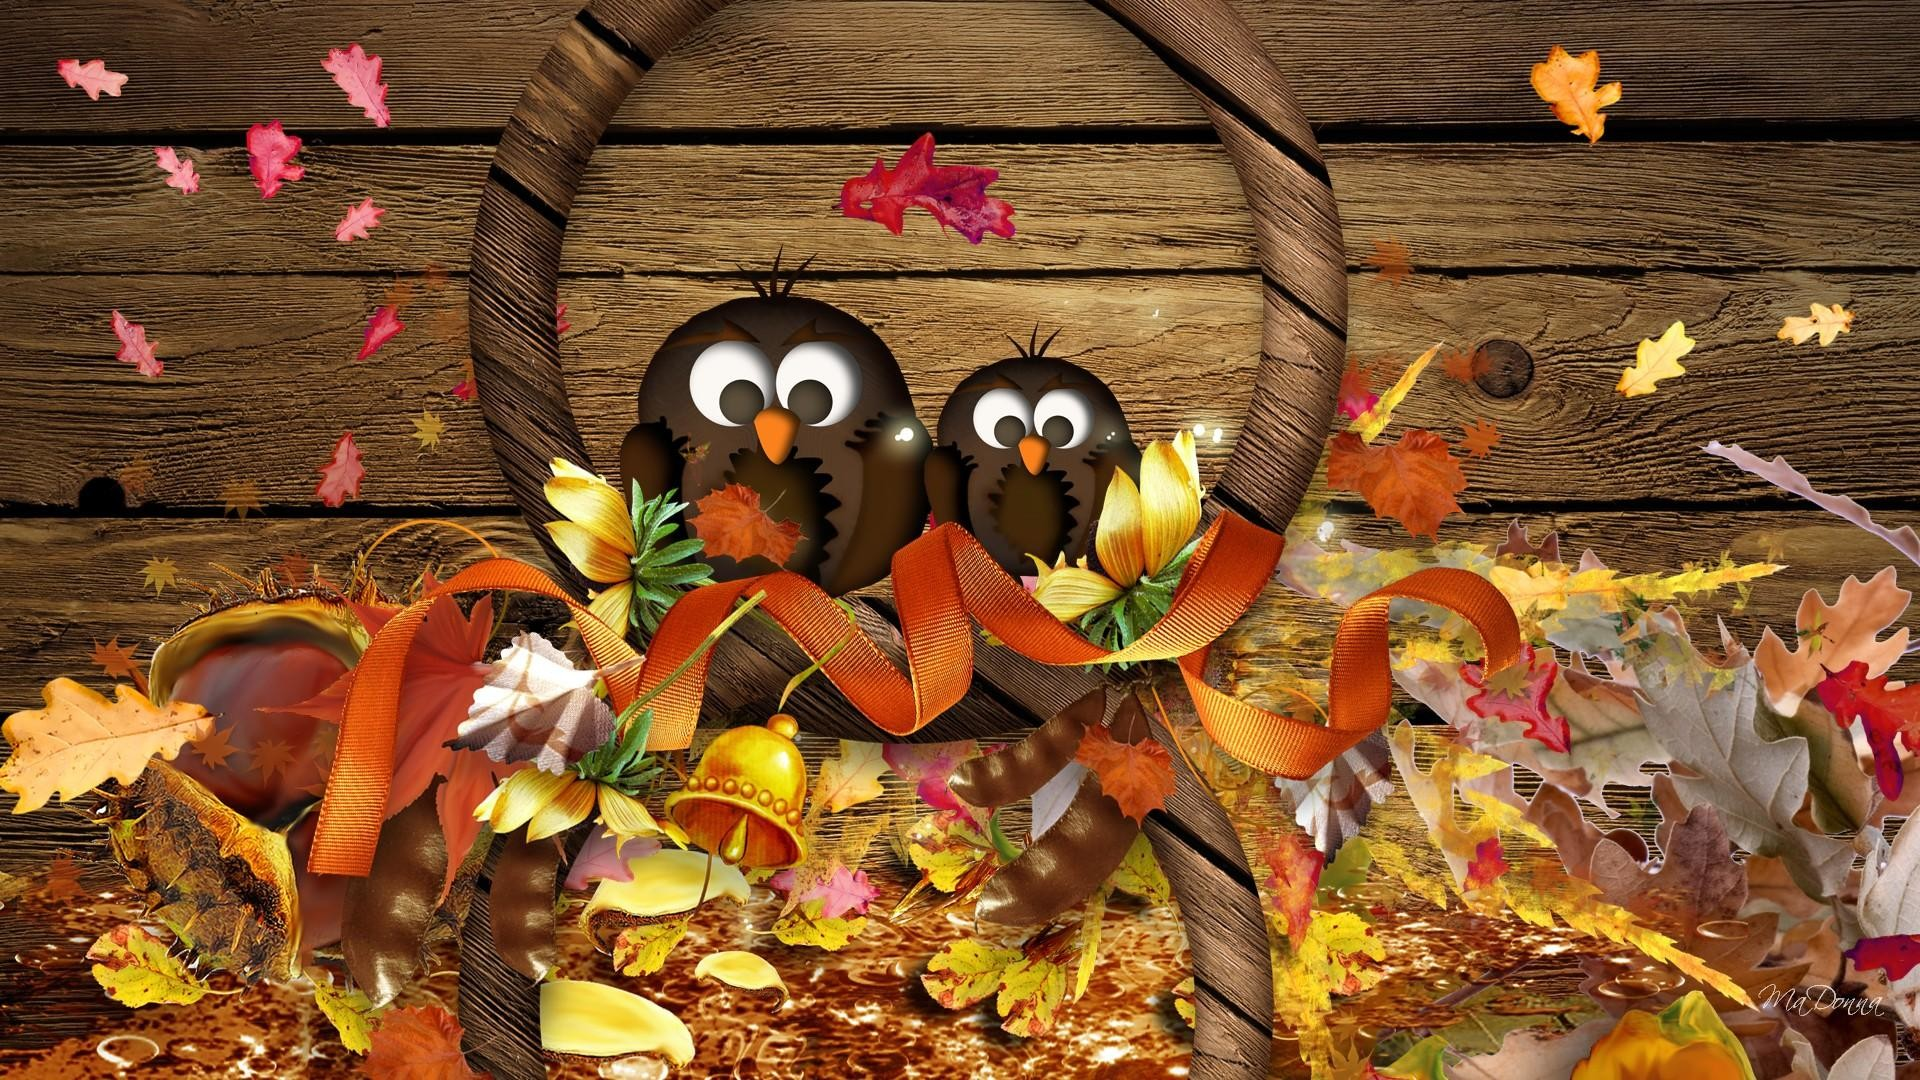 Cute Thanksgiving Screensavers | Thanksgiving HD Desktop Wallpapers for…